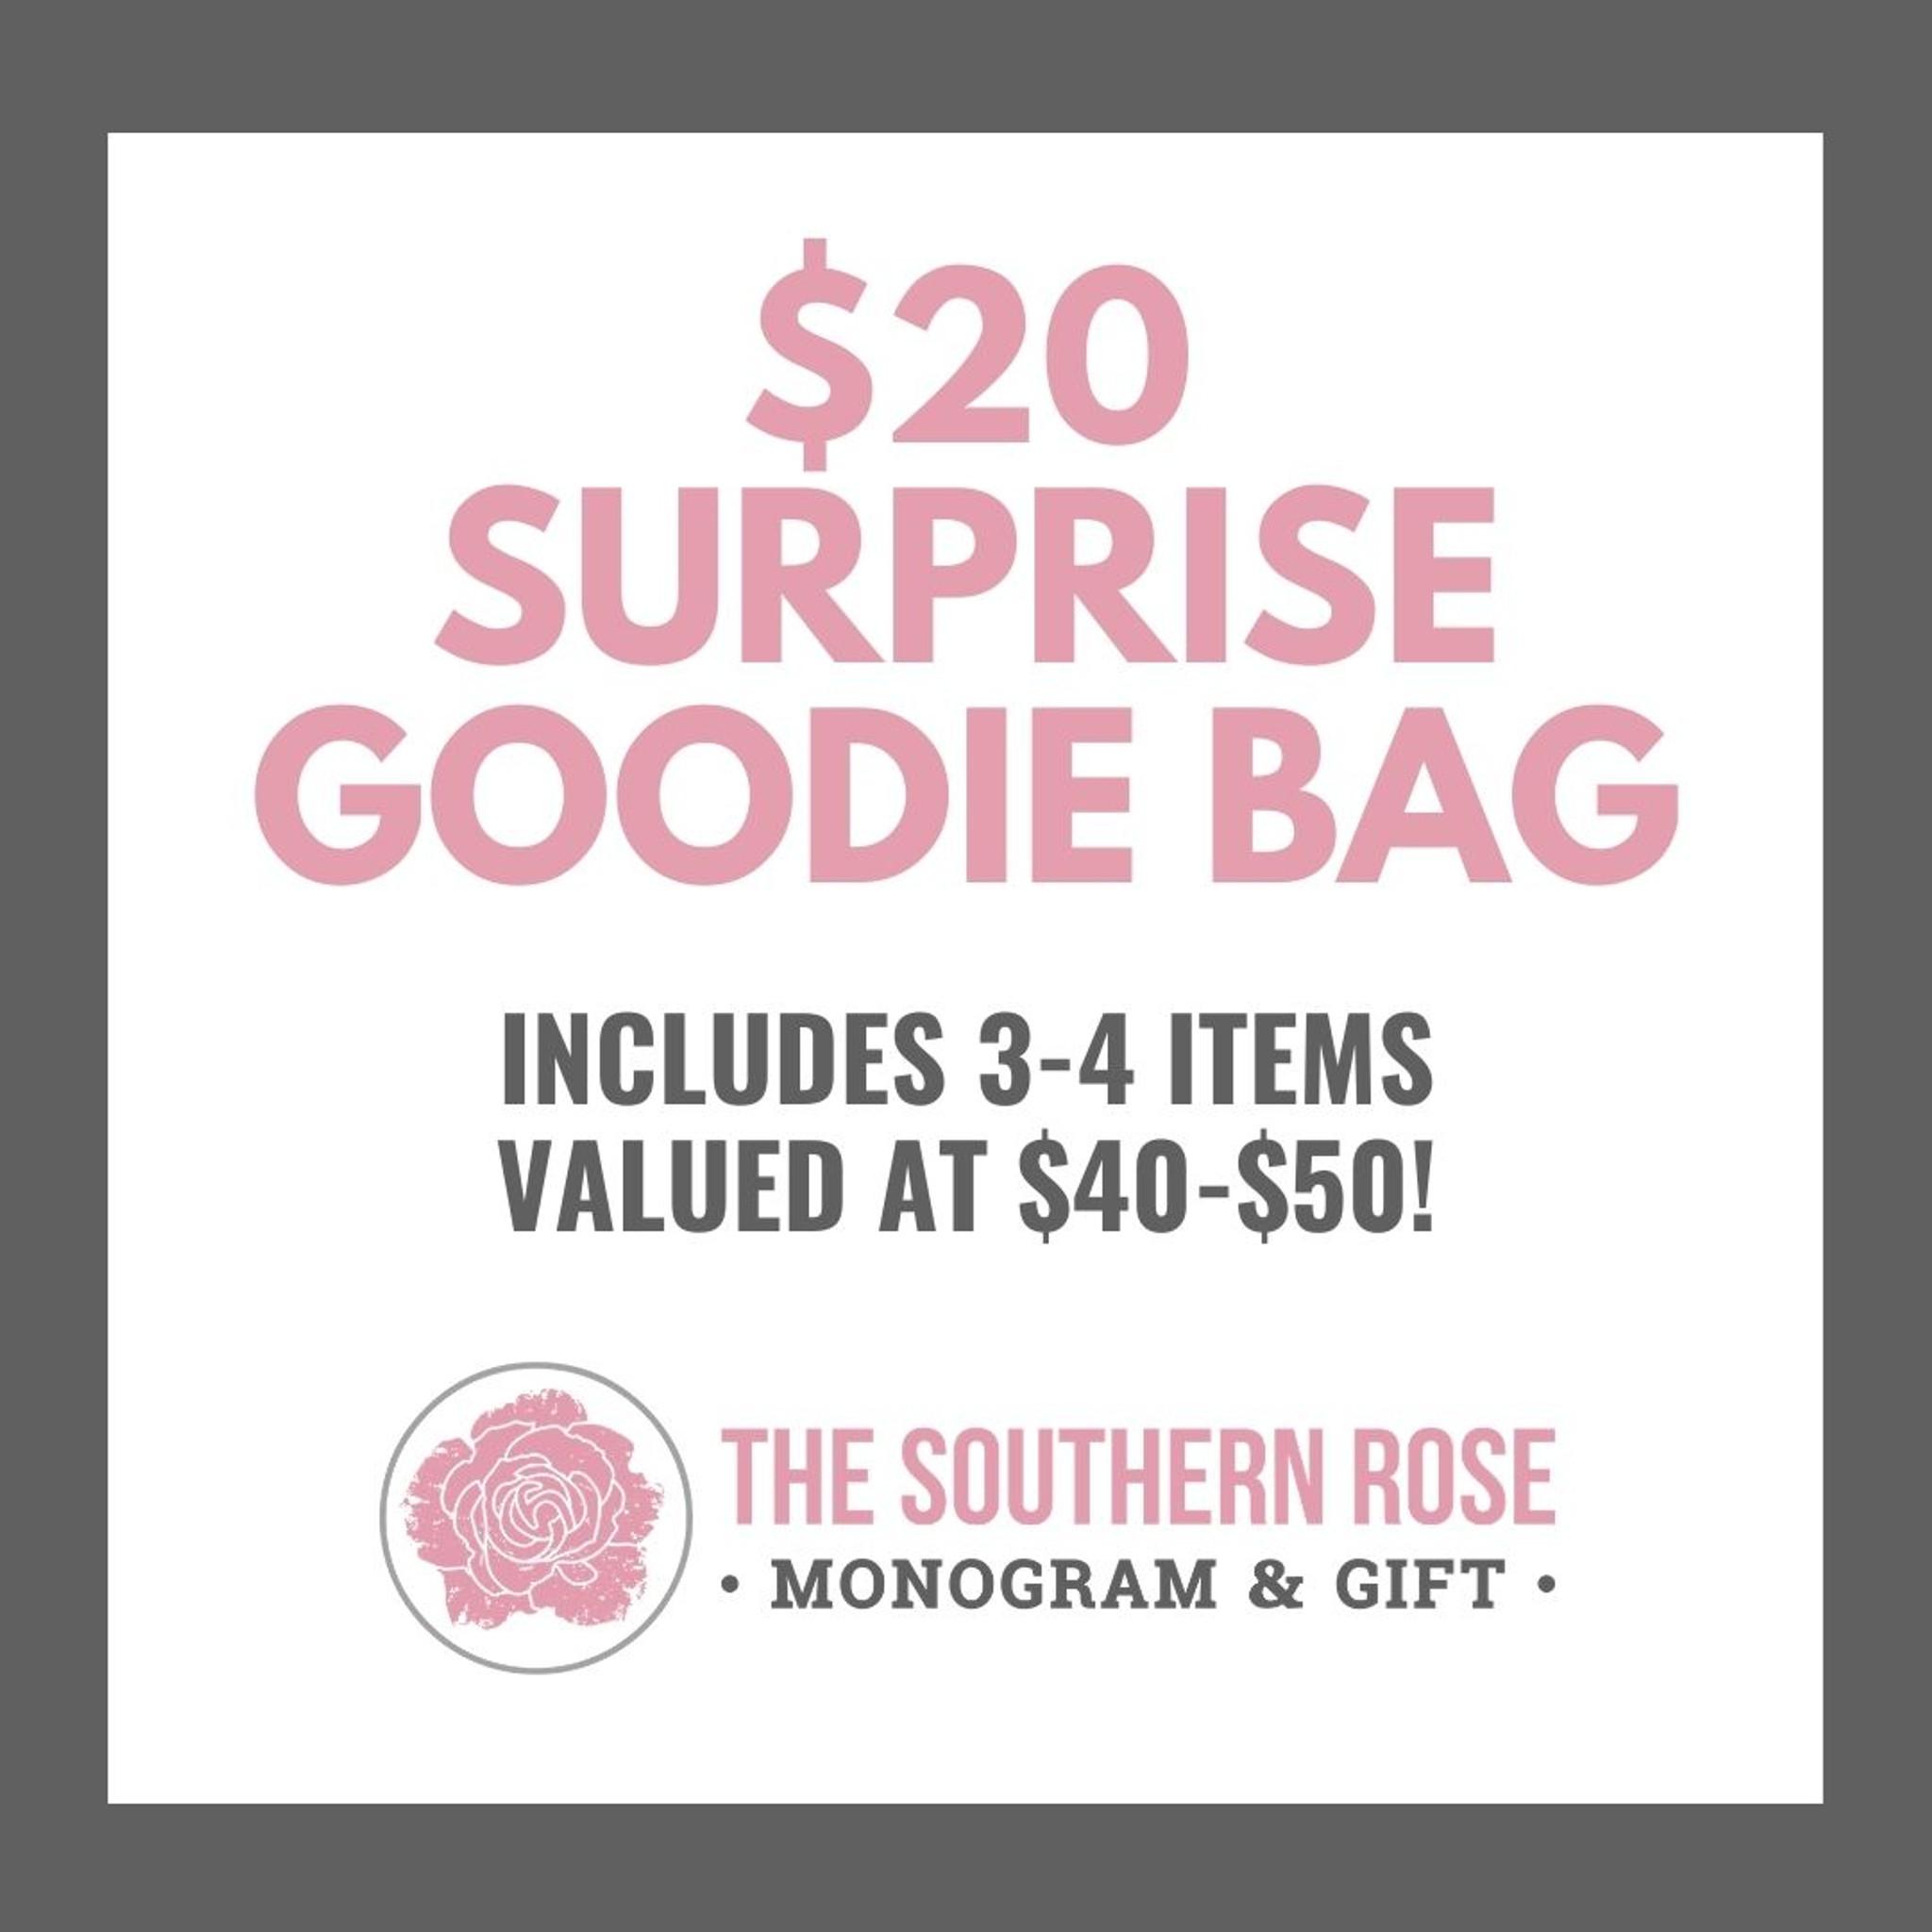 $20 Surprise Goodie Bag